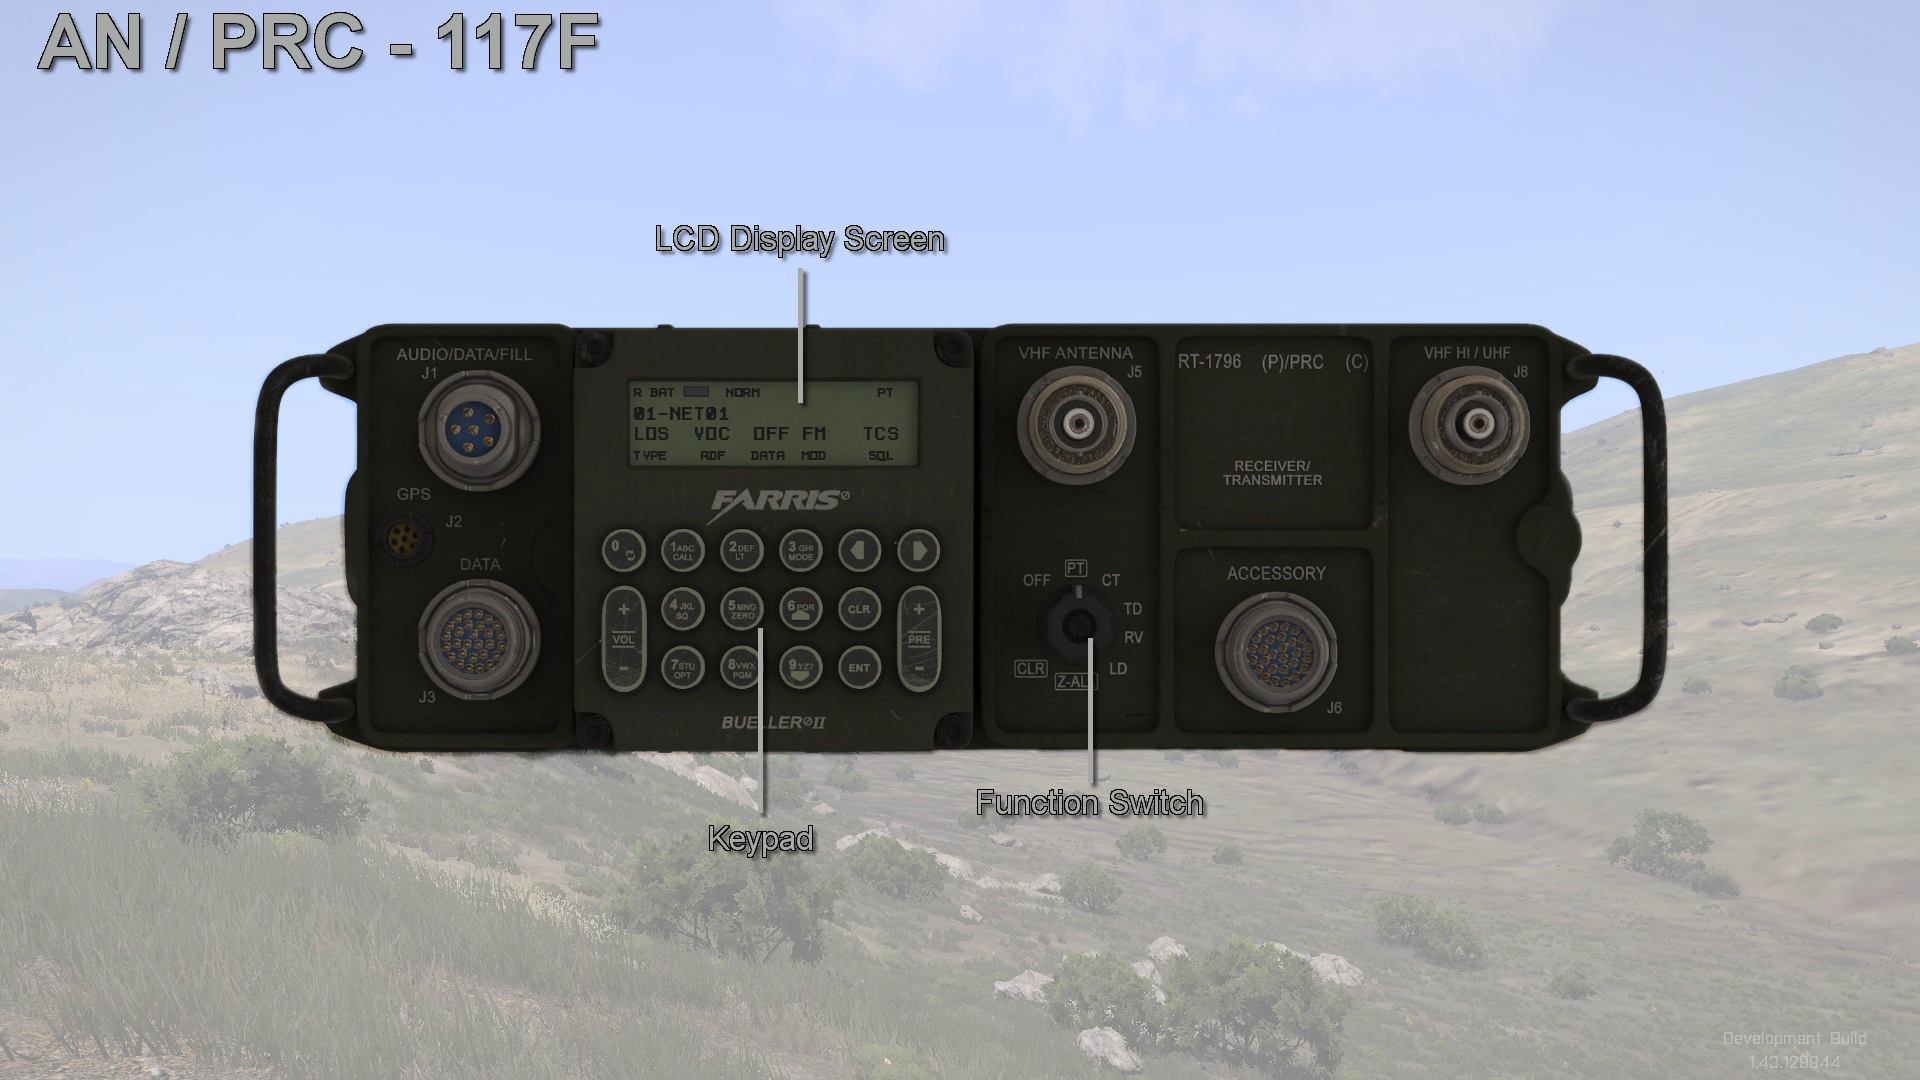 AN/PRC-117F Interface